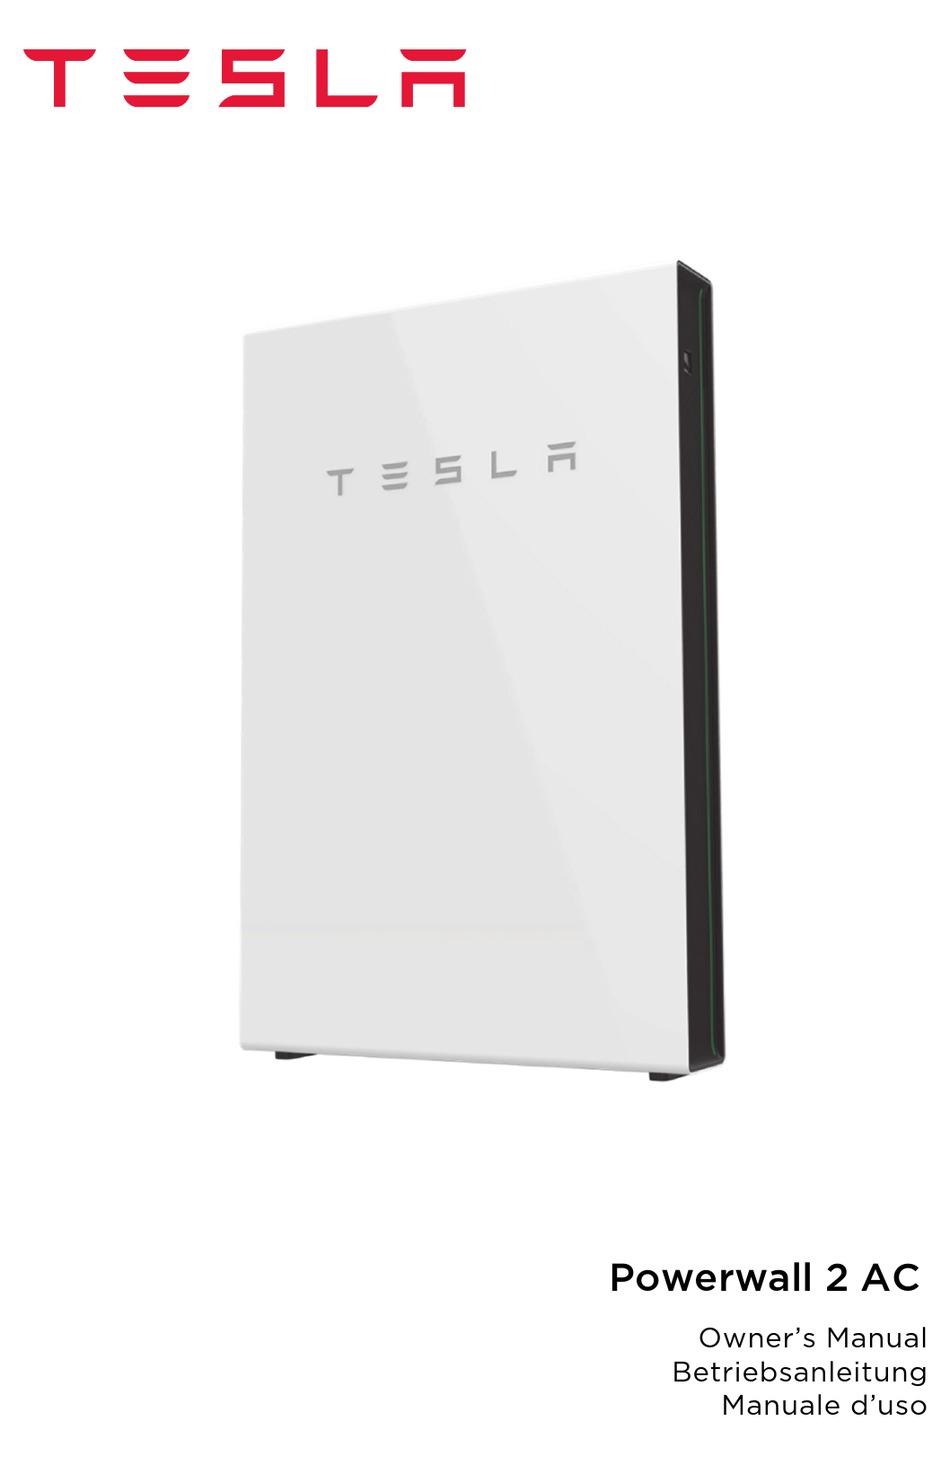 TESLA POWERWALL 2 AC OWNERS MANUAL Pdf Download | ManualsLib